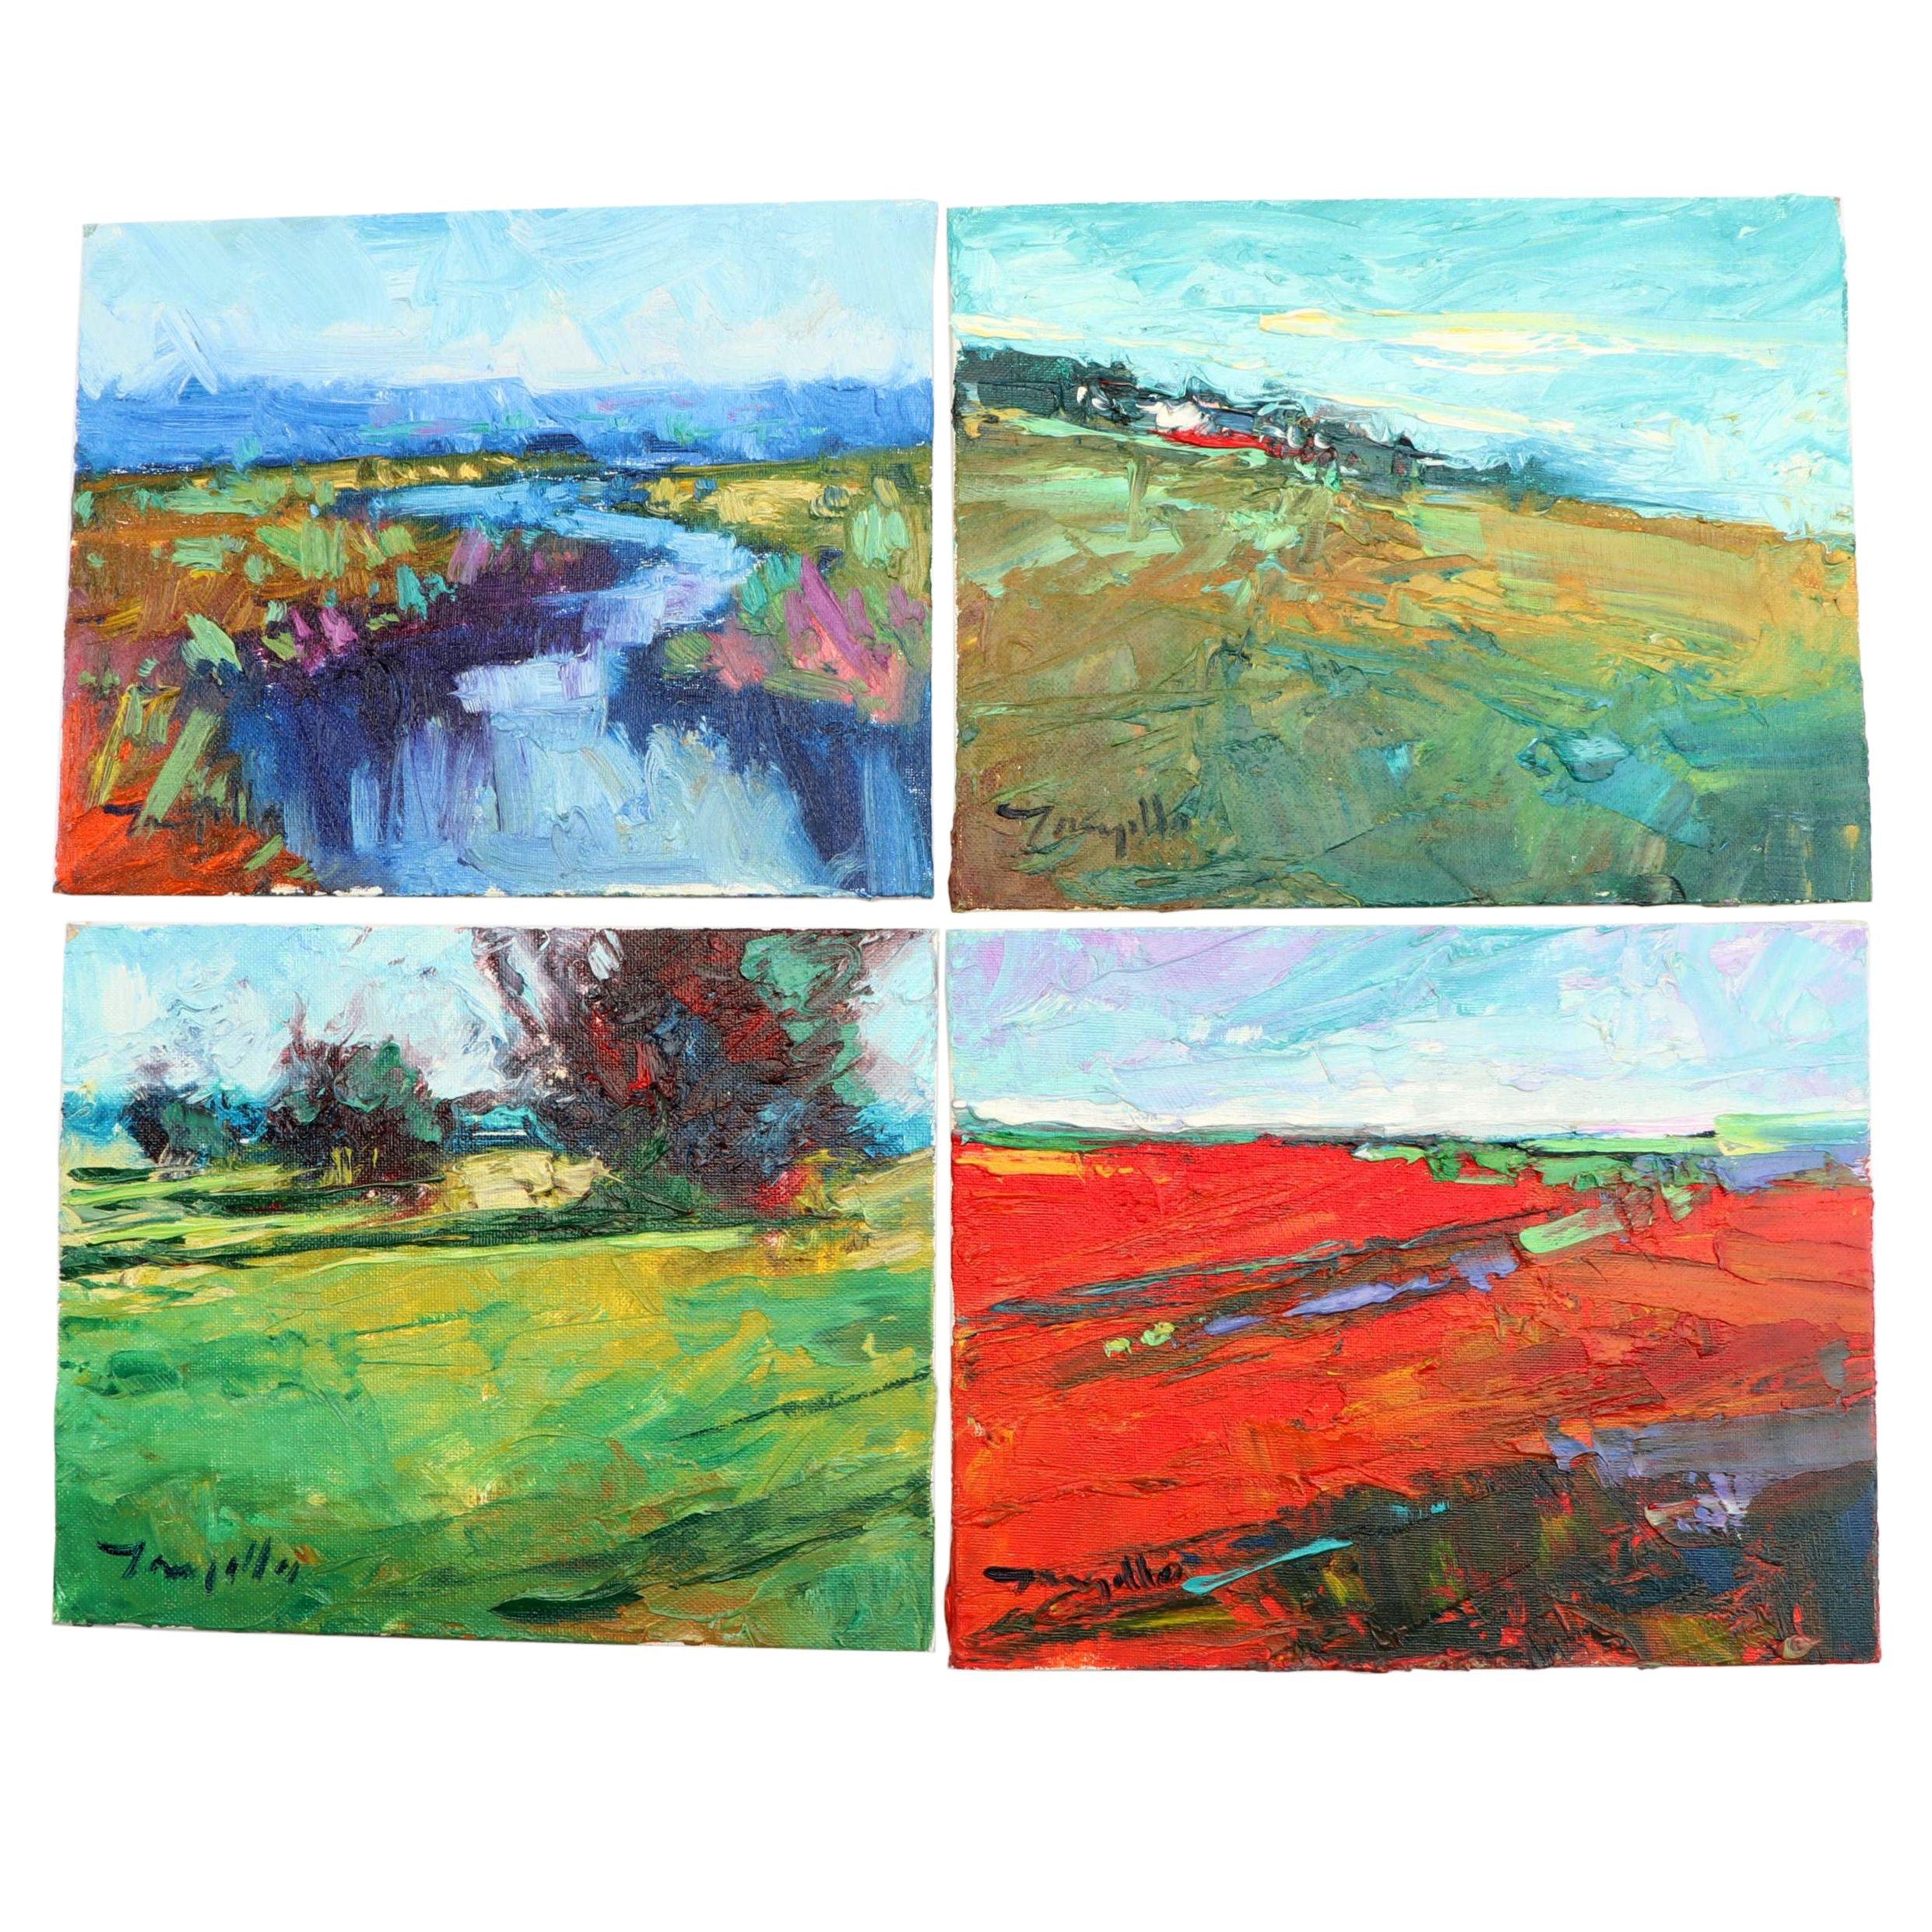 Jose Trujillo Impressionistic Landscape Oil Paintings